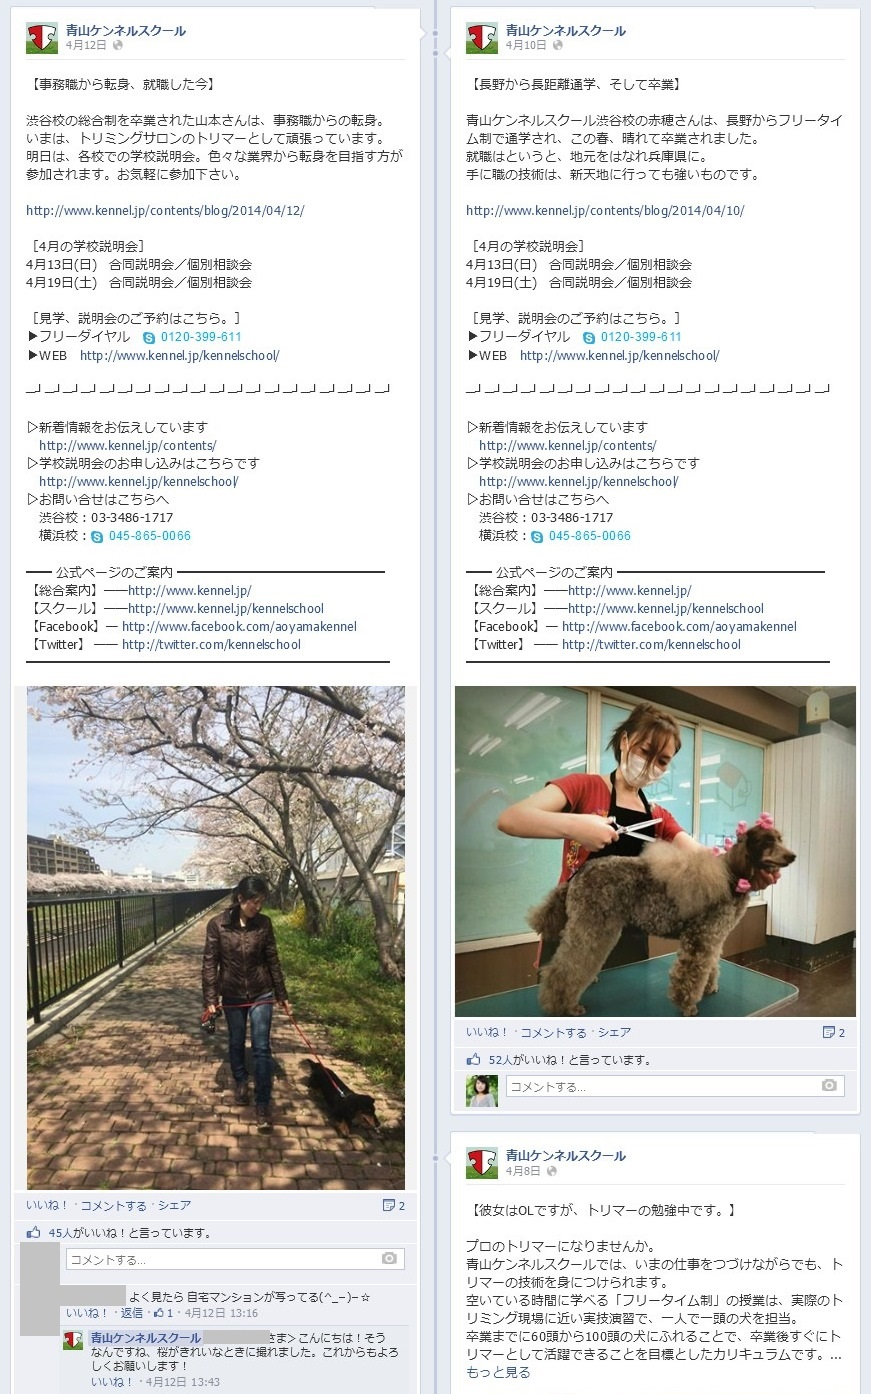 Facebook 活用 事例 プロモーション 青山ケンネルスクール/青山ケンネルインターナショナル株式会社